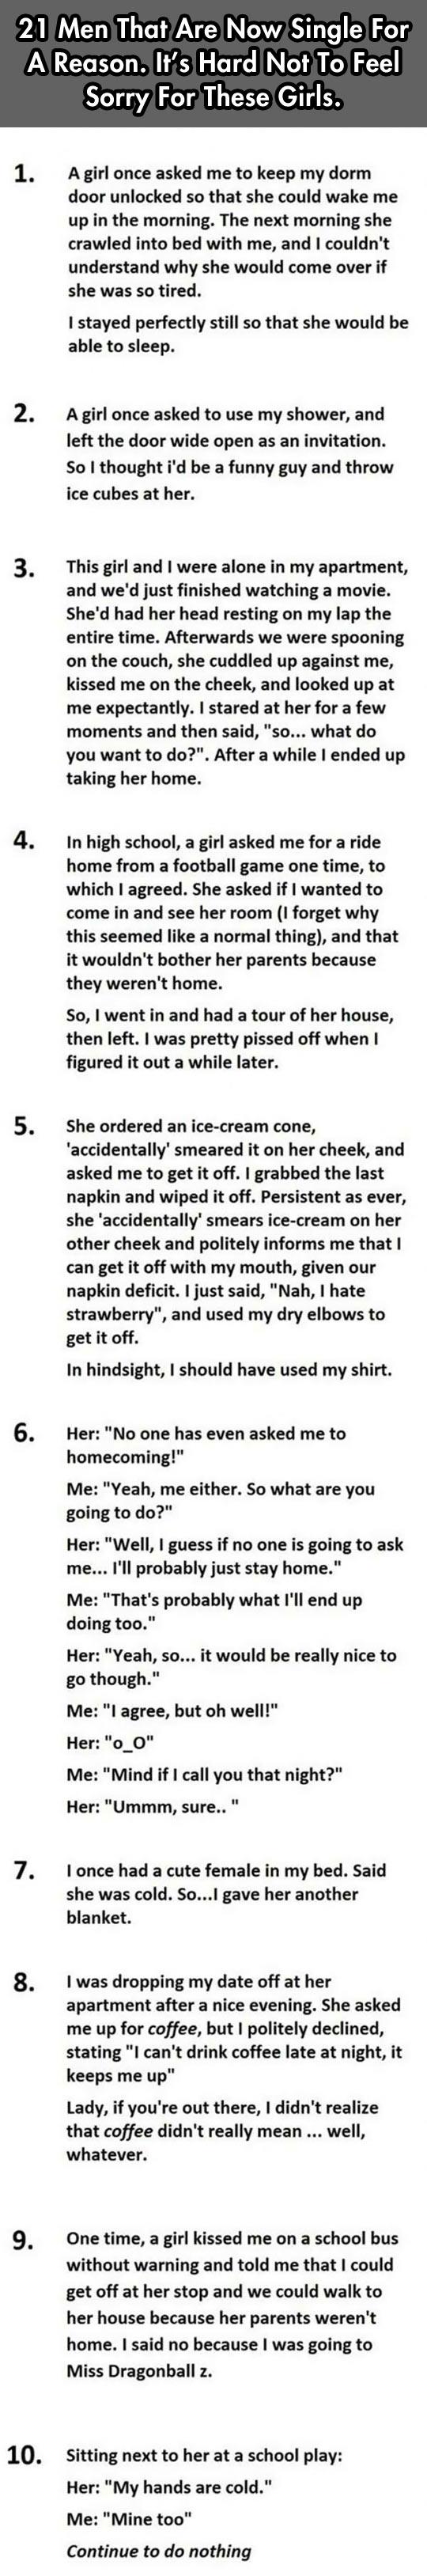 funny-girl-boys-single-list-story